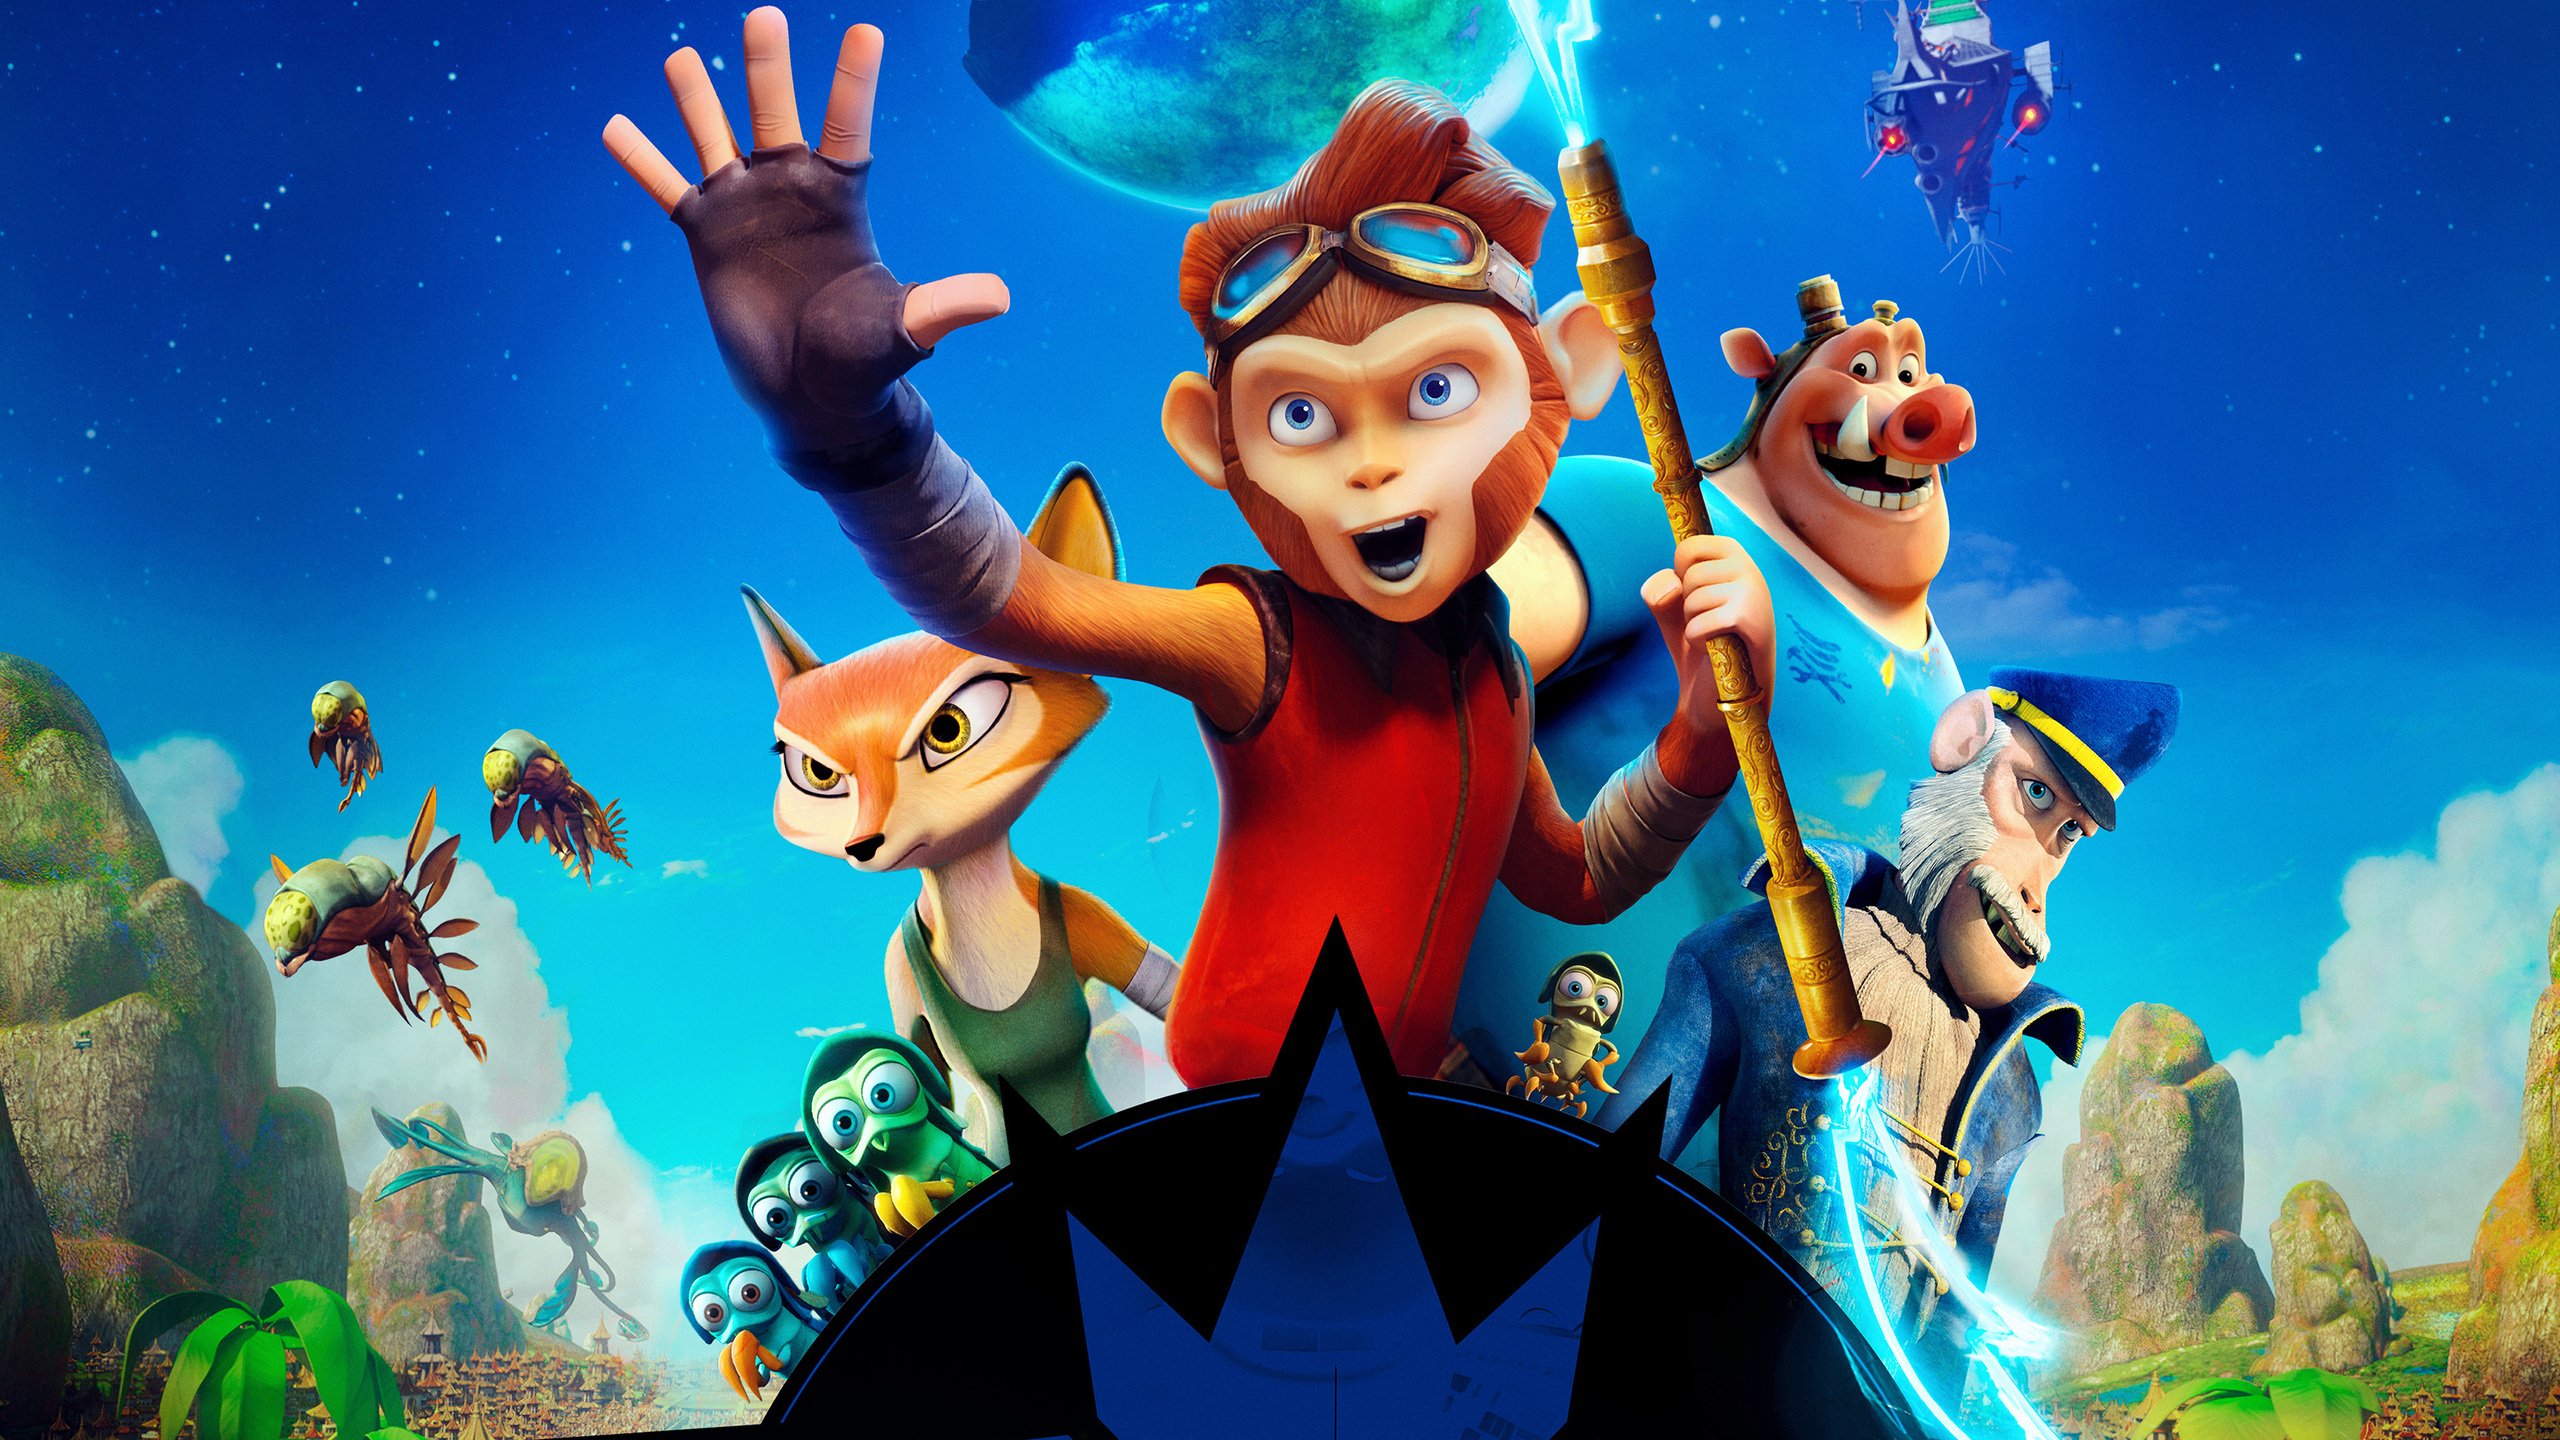 2560x1440 Spark 2017 Animated Movie 1440p Resolution Hd 4k